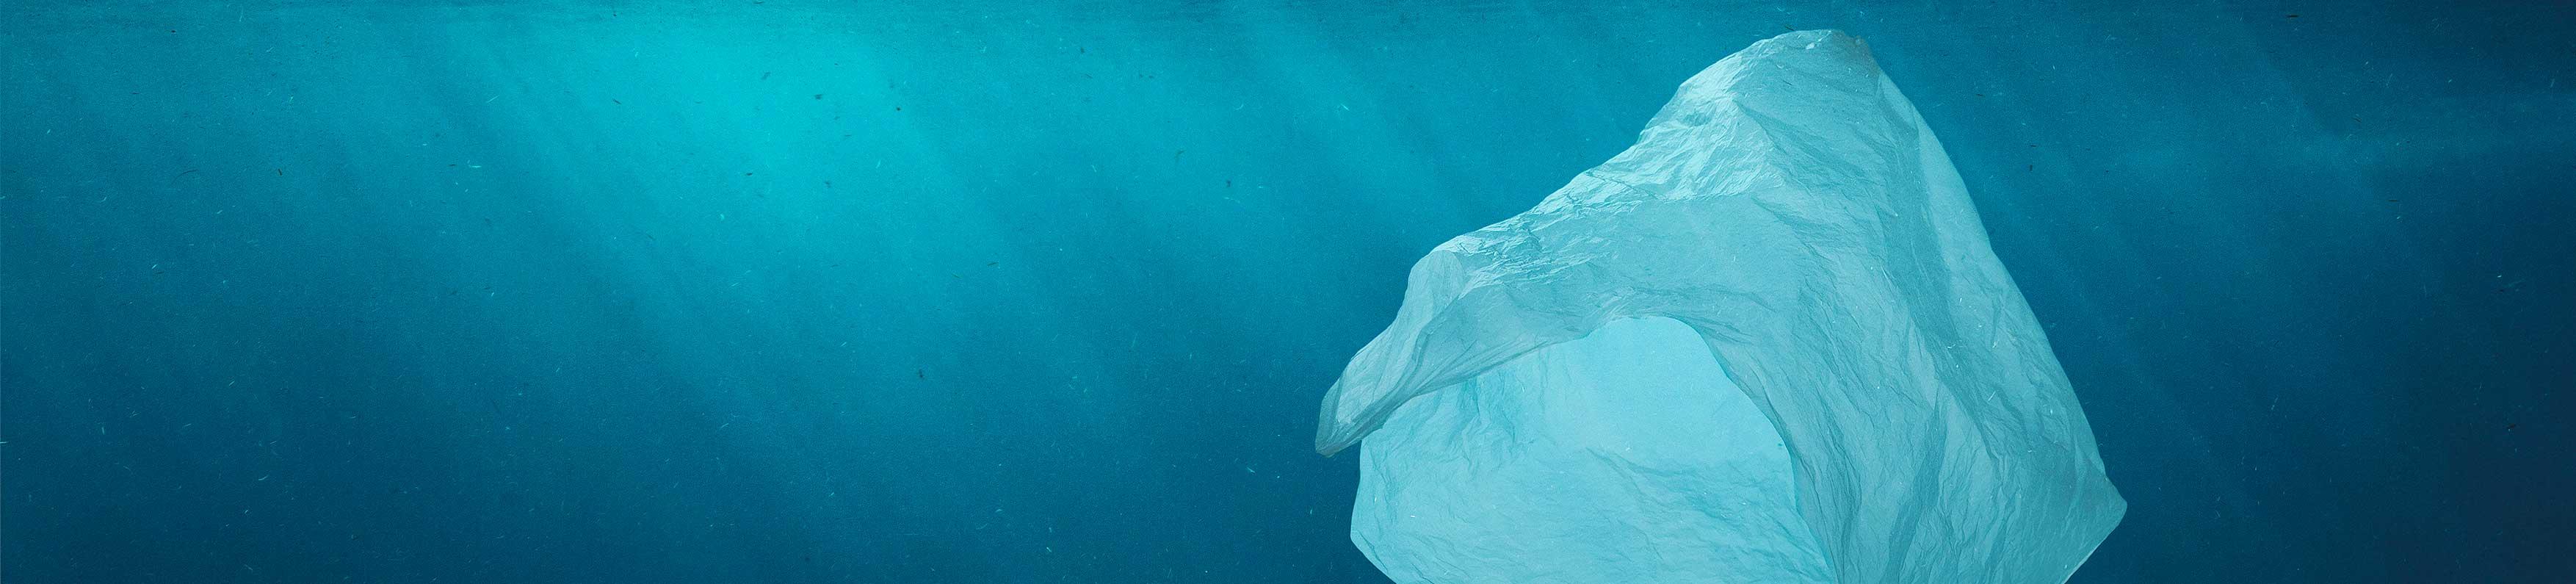 Biodegradable en agua INZEA NUREL Biopolímeros